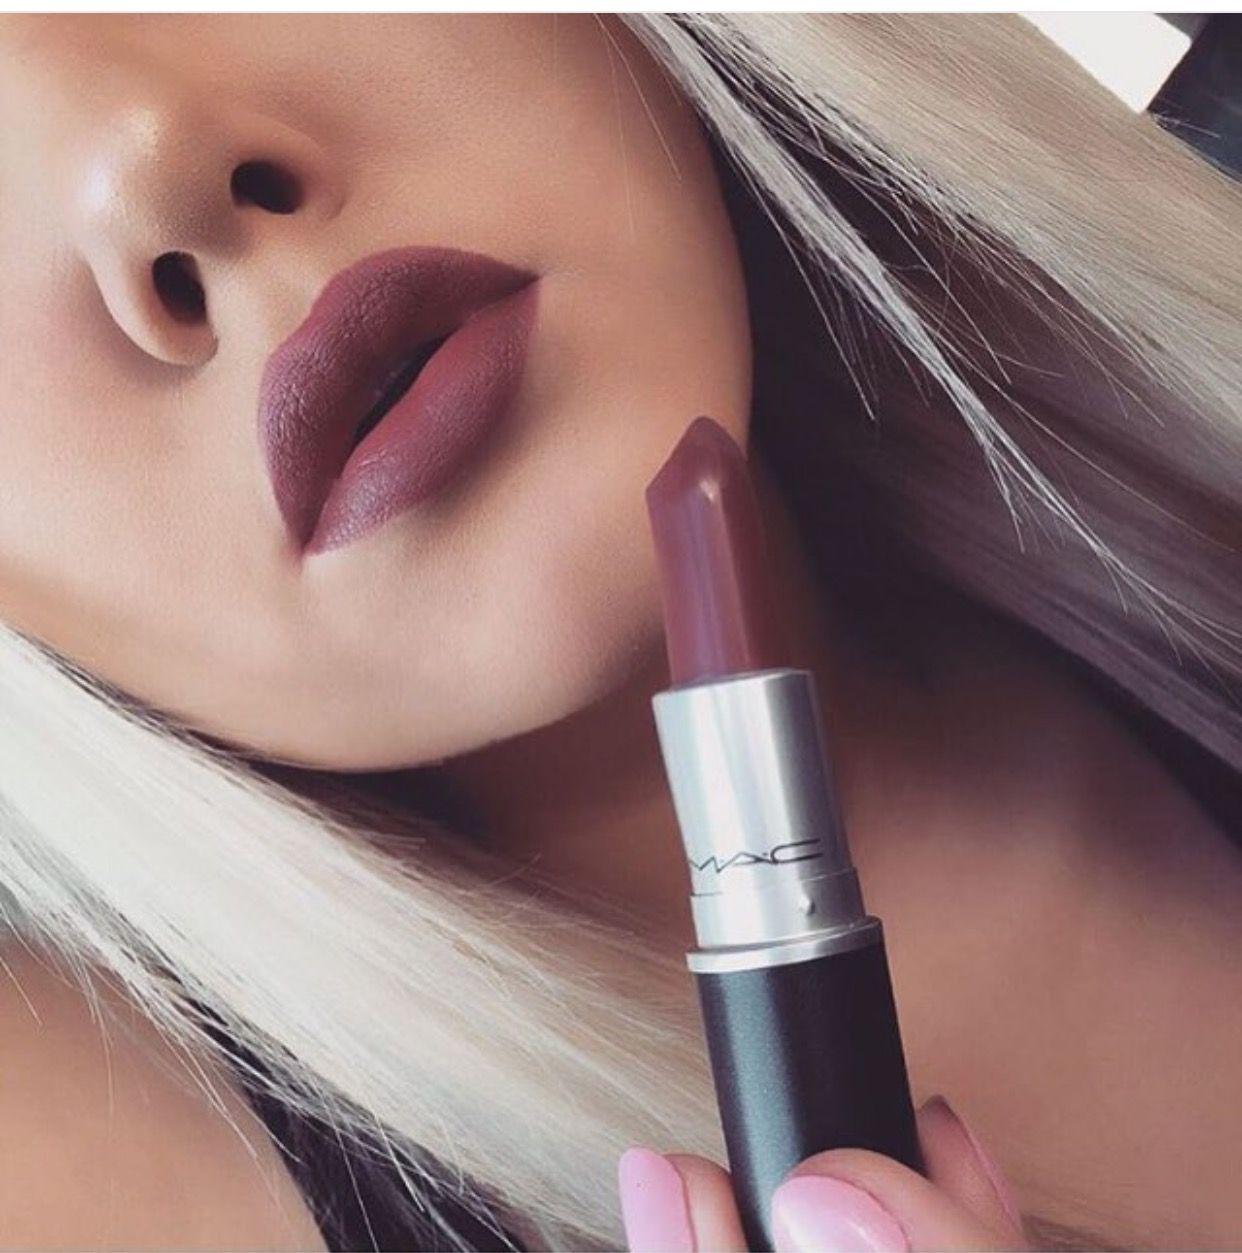 mac verve beauty lippenstifte lippenstift und make up. Black Bedroom Furniture Sets. Home Design Ideas